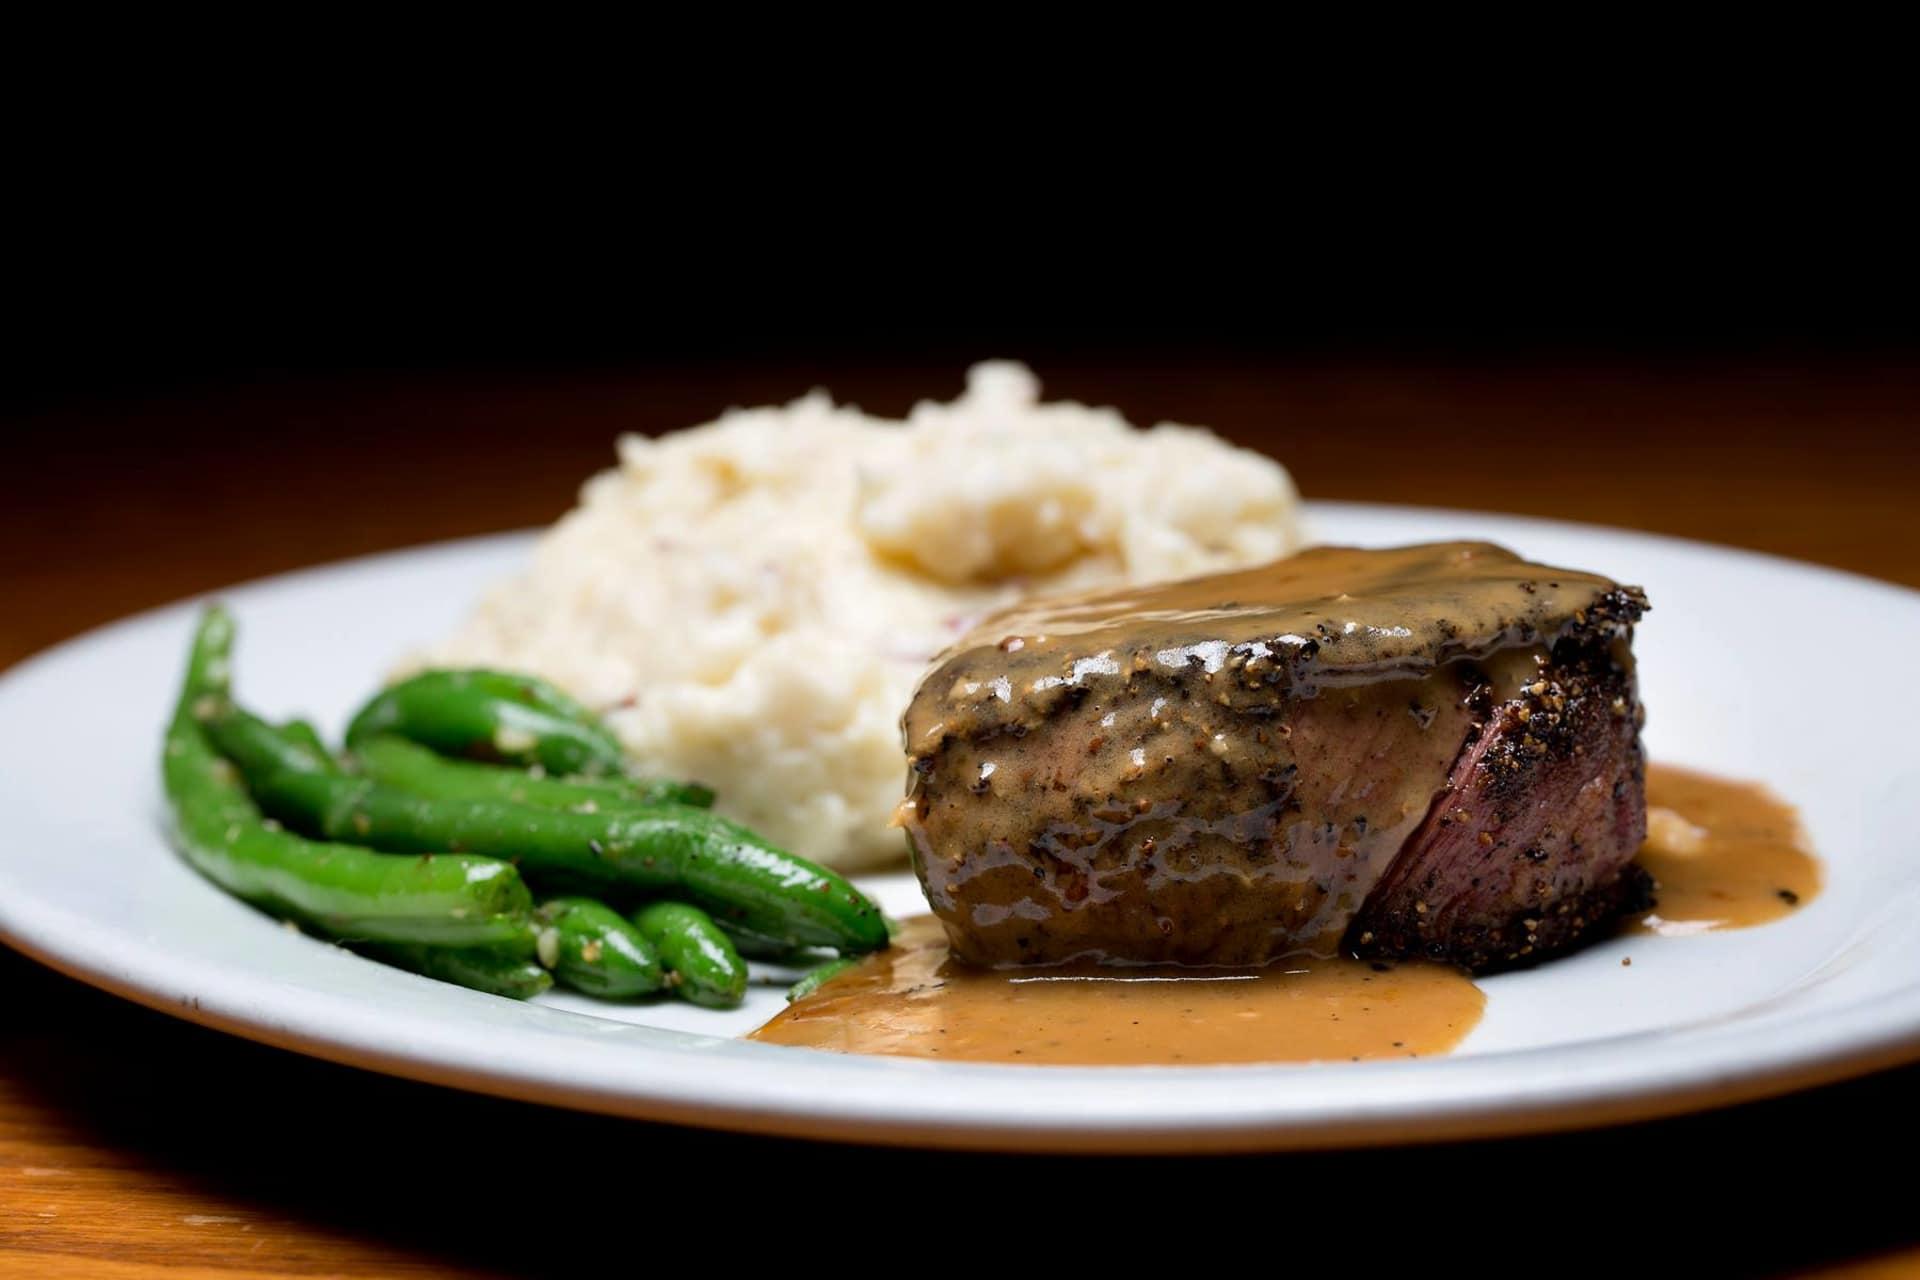 9 oz. Filet of Beef